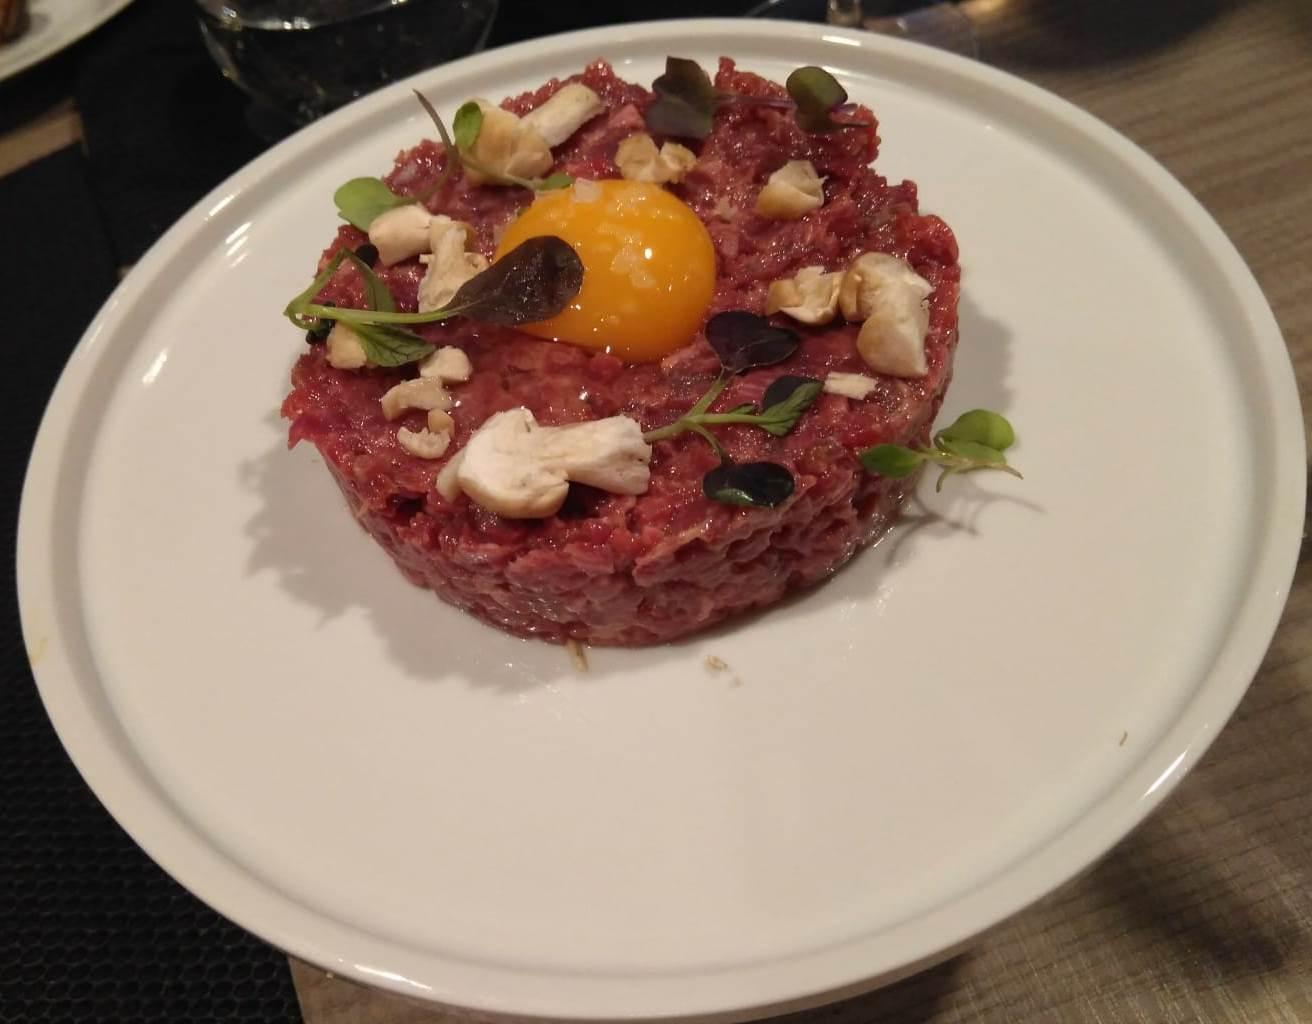 Restaurante en Les Preses Steak tartar.